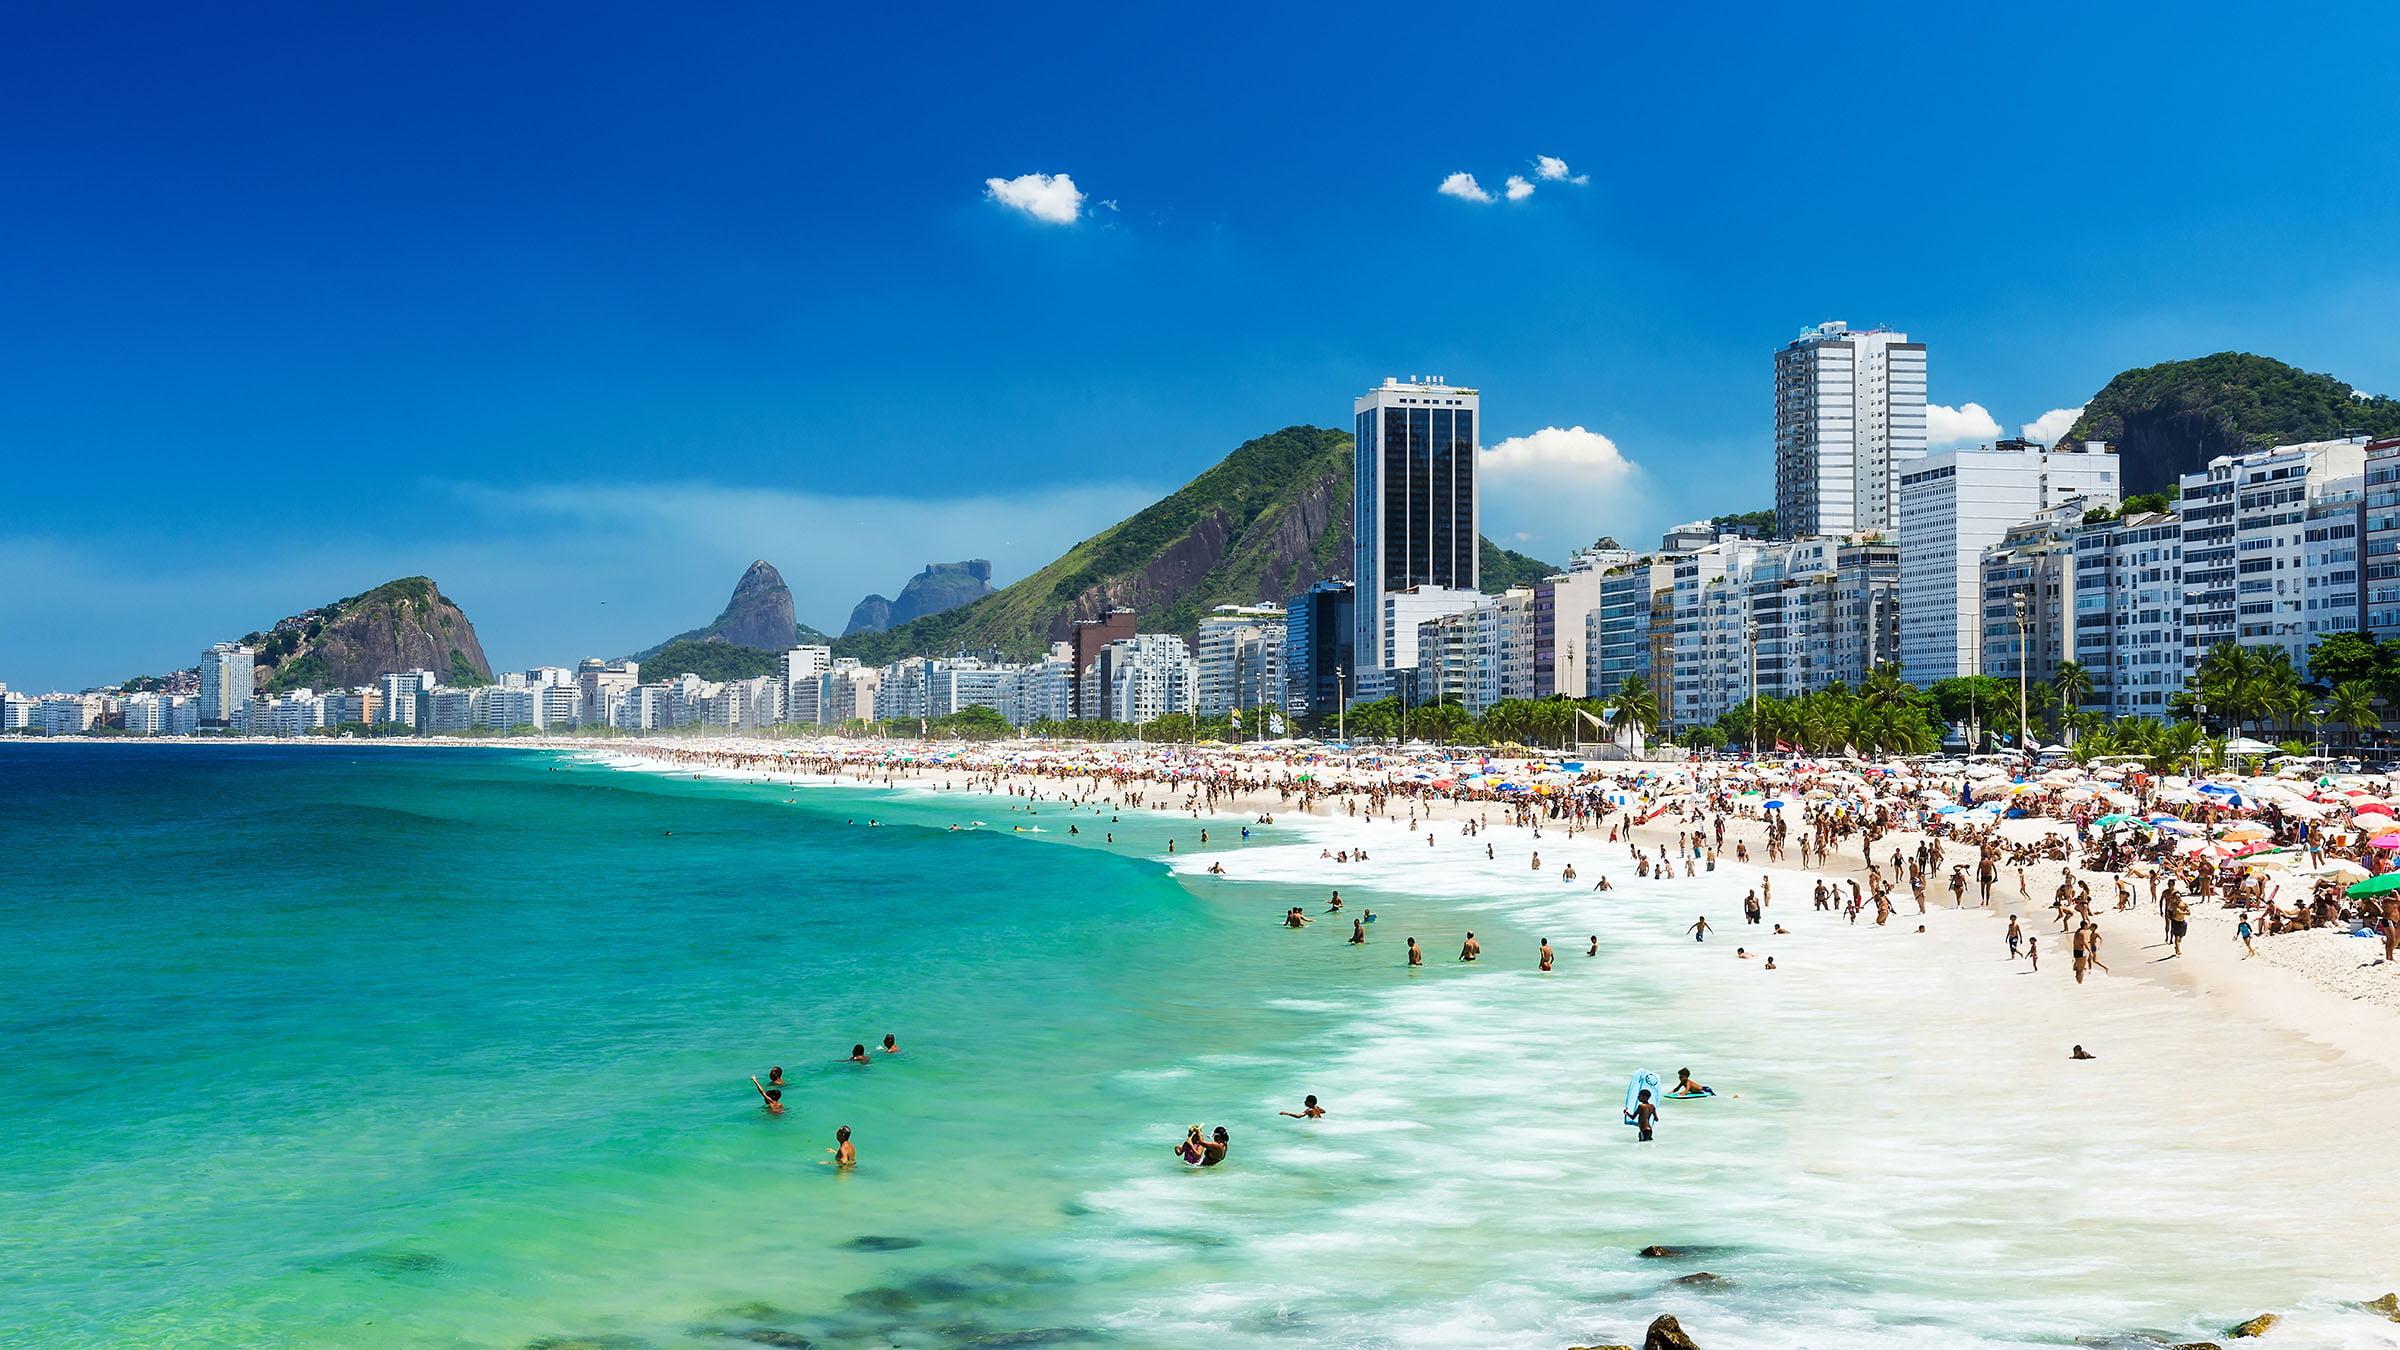 Resultado de imagen para playa copacabana rio de janeiro